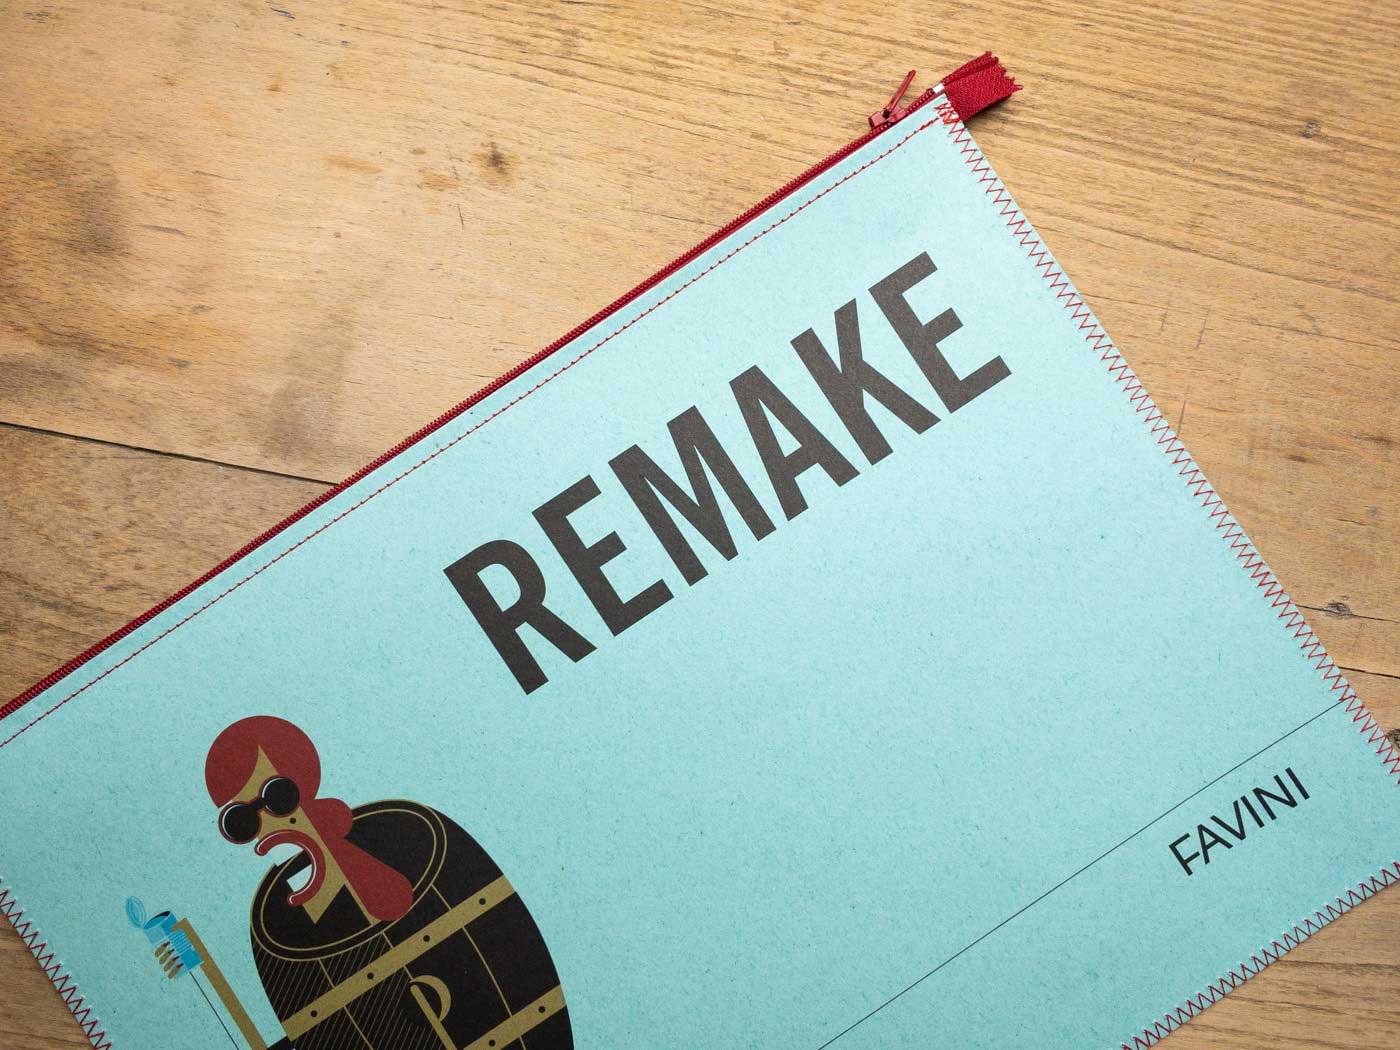 papier-remake-cuir-recycle-enveloppe-impression-RSE